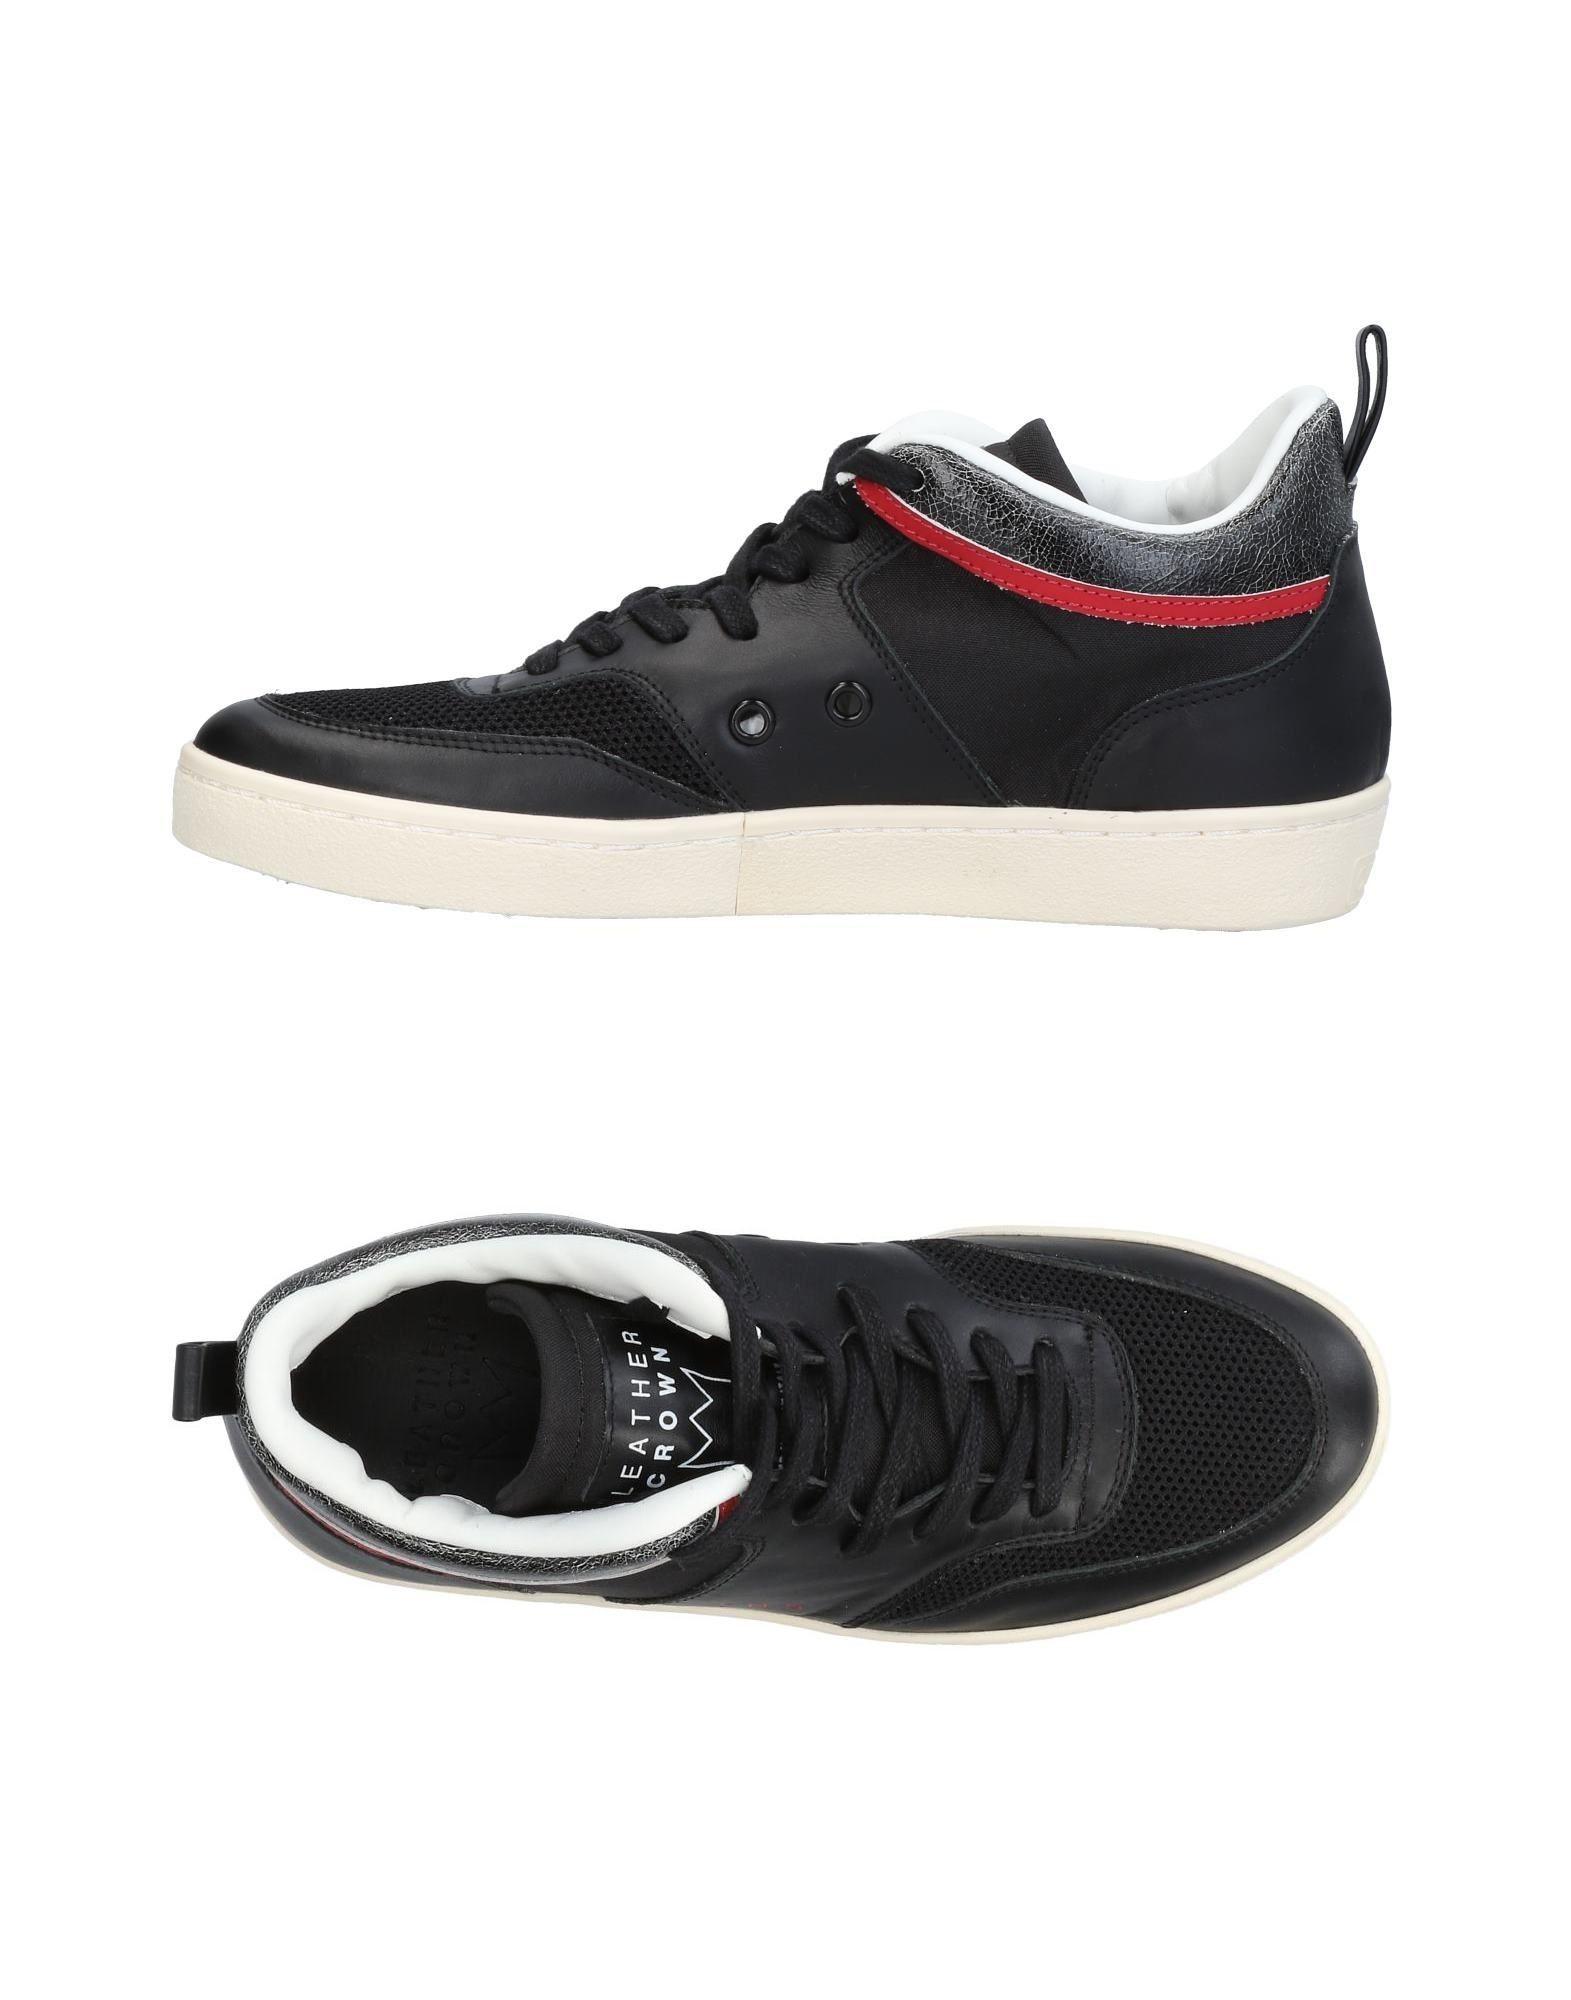 Leder Crown Sneakers Damen Gutes Preis-Leistungs-Verhältnis, es lohnt sich 1181